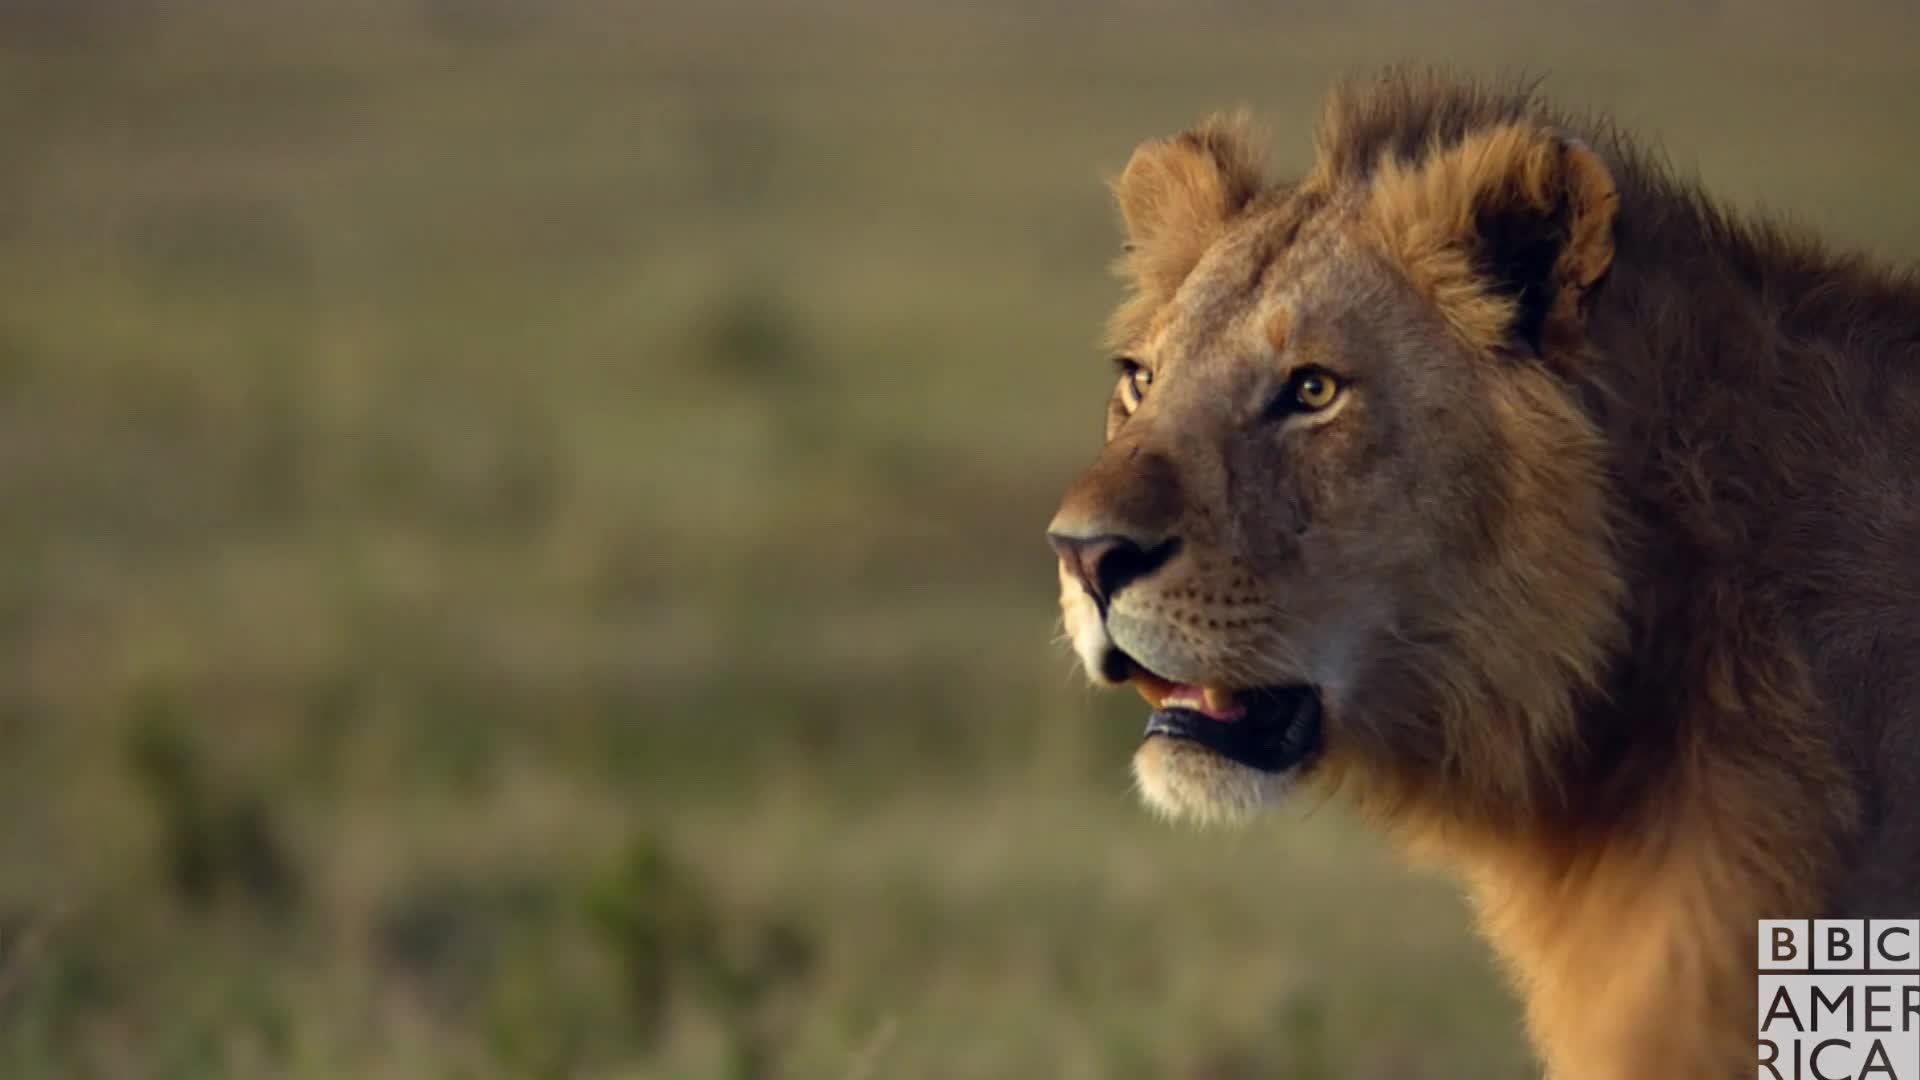 animal, animals, bbc america, bbc america: dynasties, dynasties, lion, lions, shocked, surprise, wow, Dynasties Lion Tatu Surprised GIFs